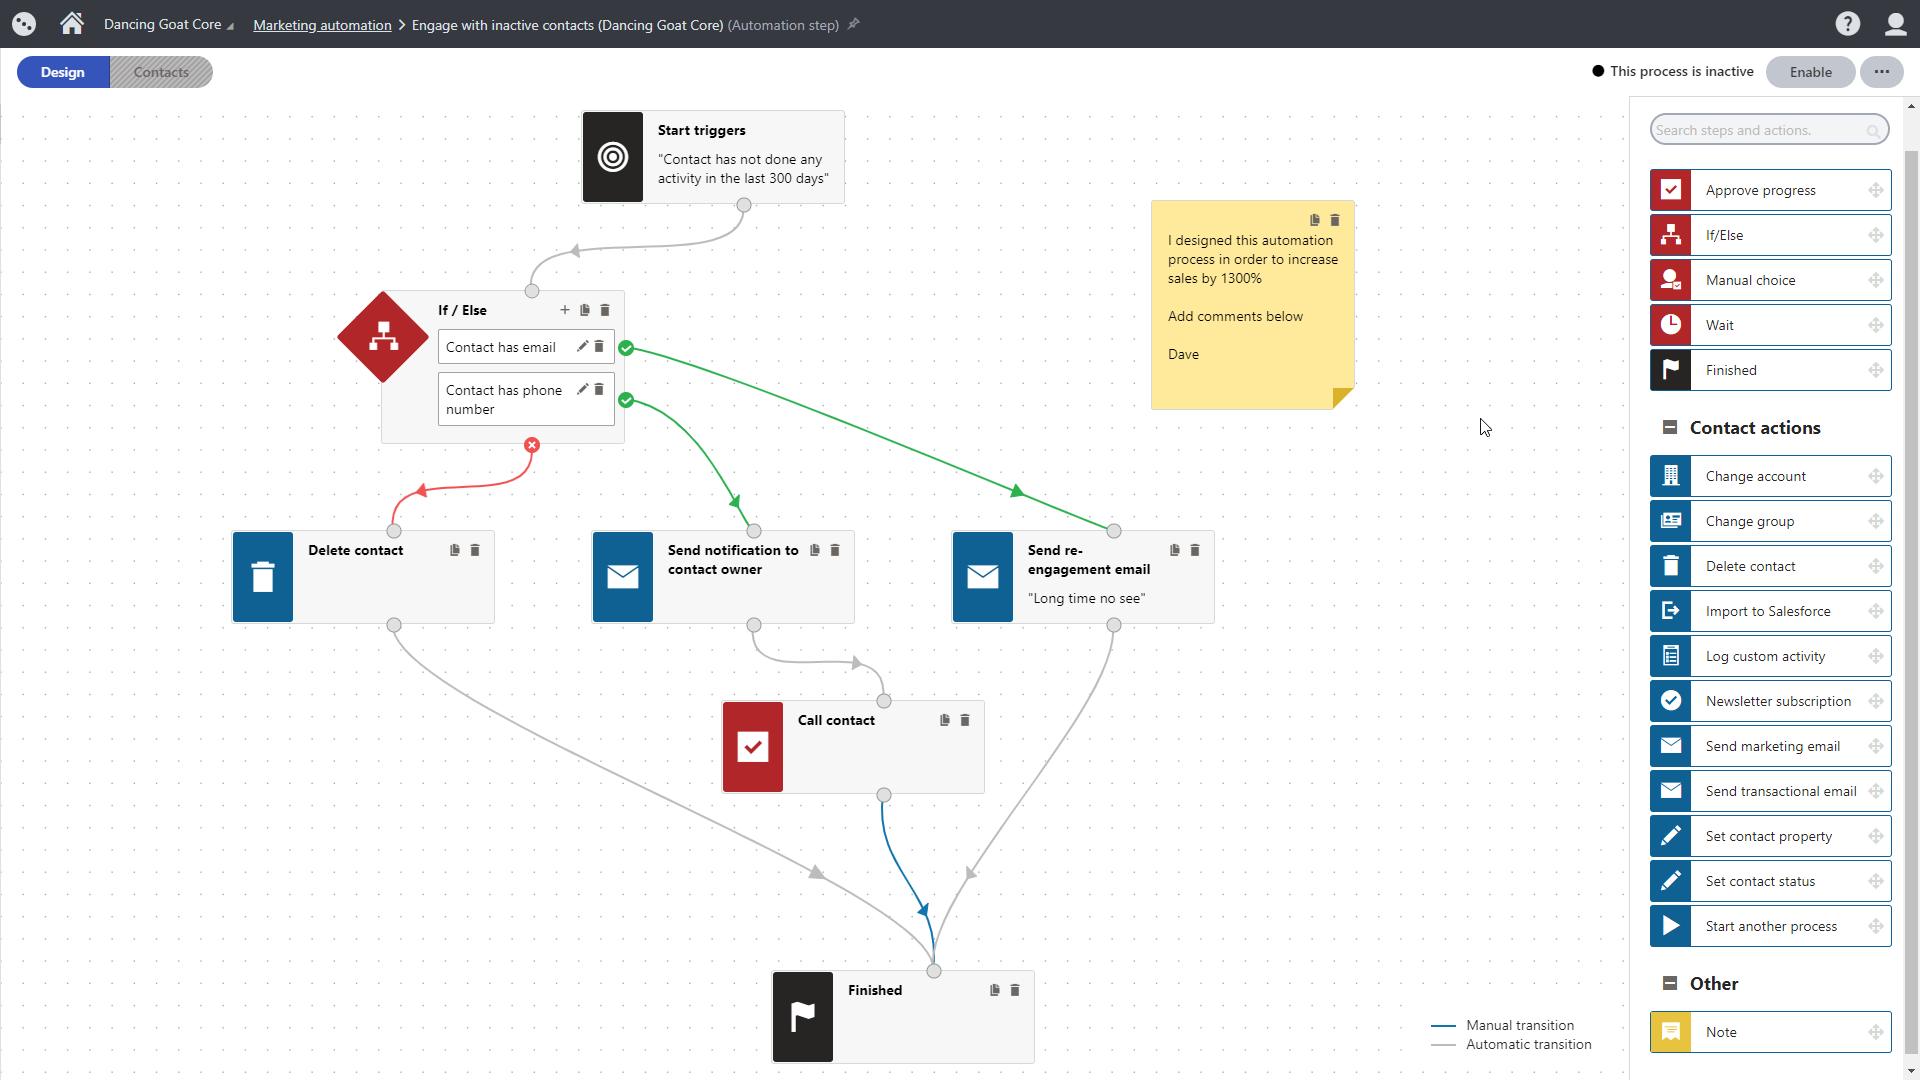 Kentico Xperience 13's new marketing automation UI